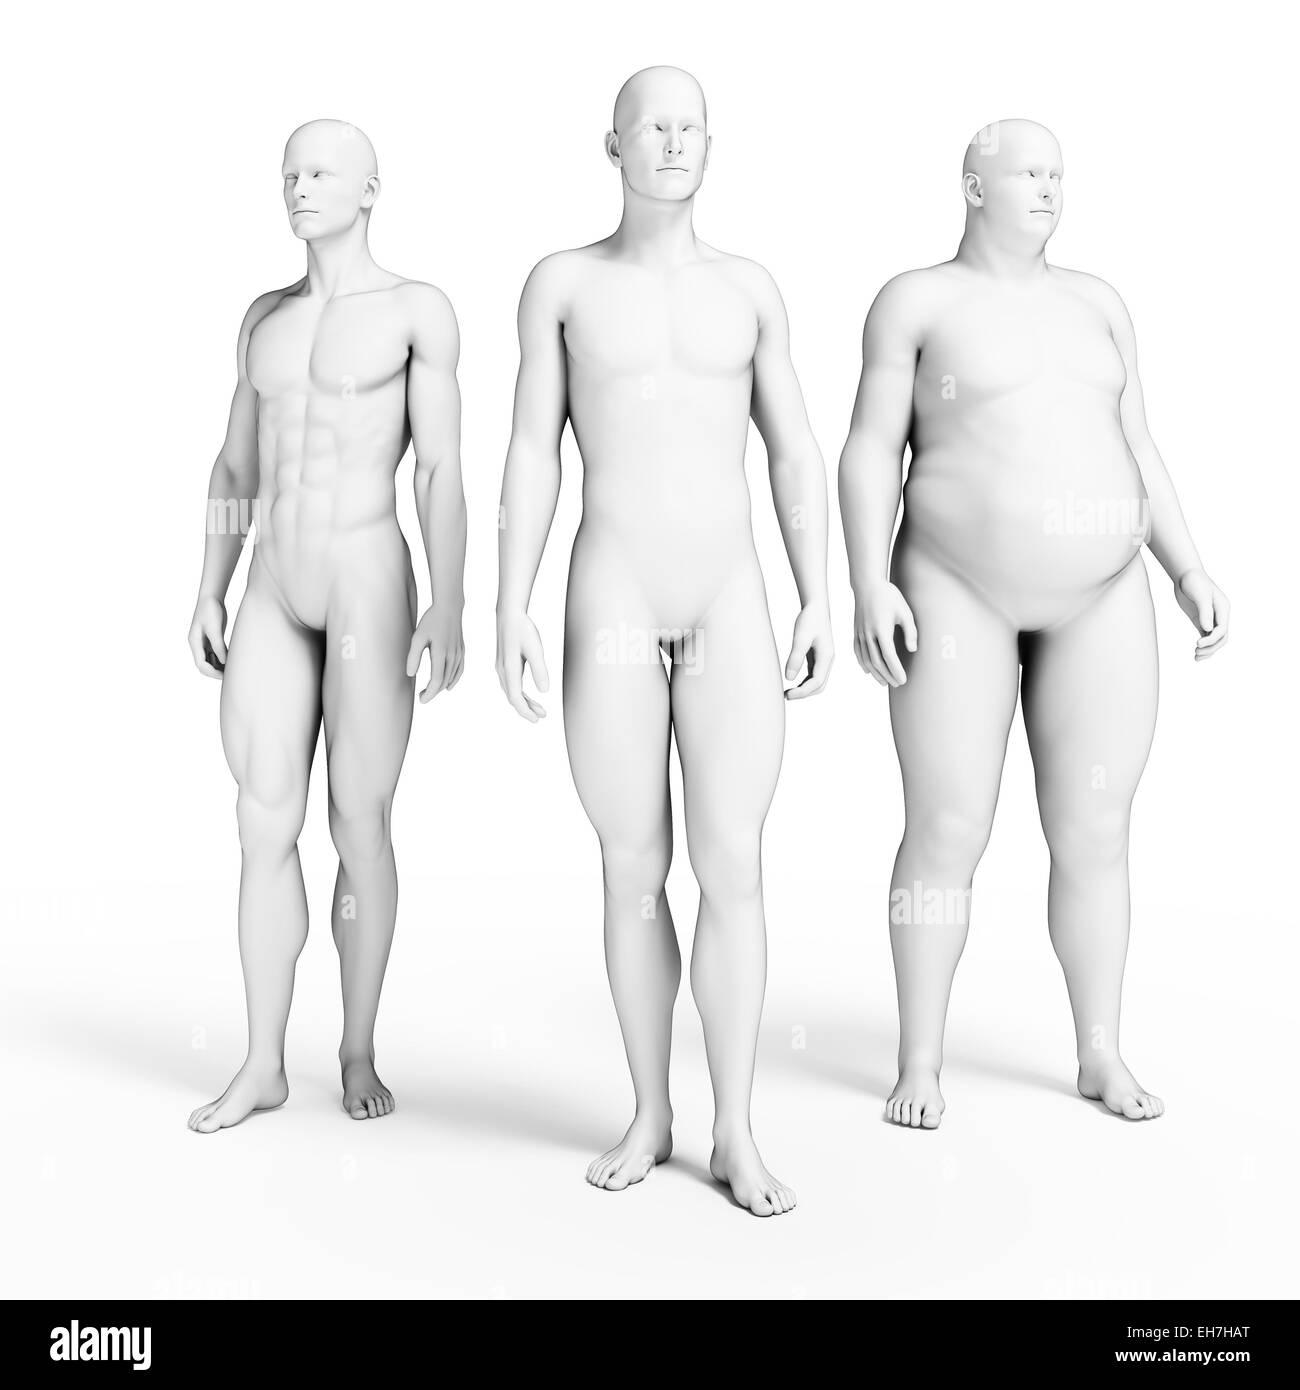 Various body shapes, illustration - Stock Image